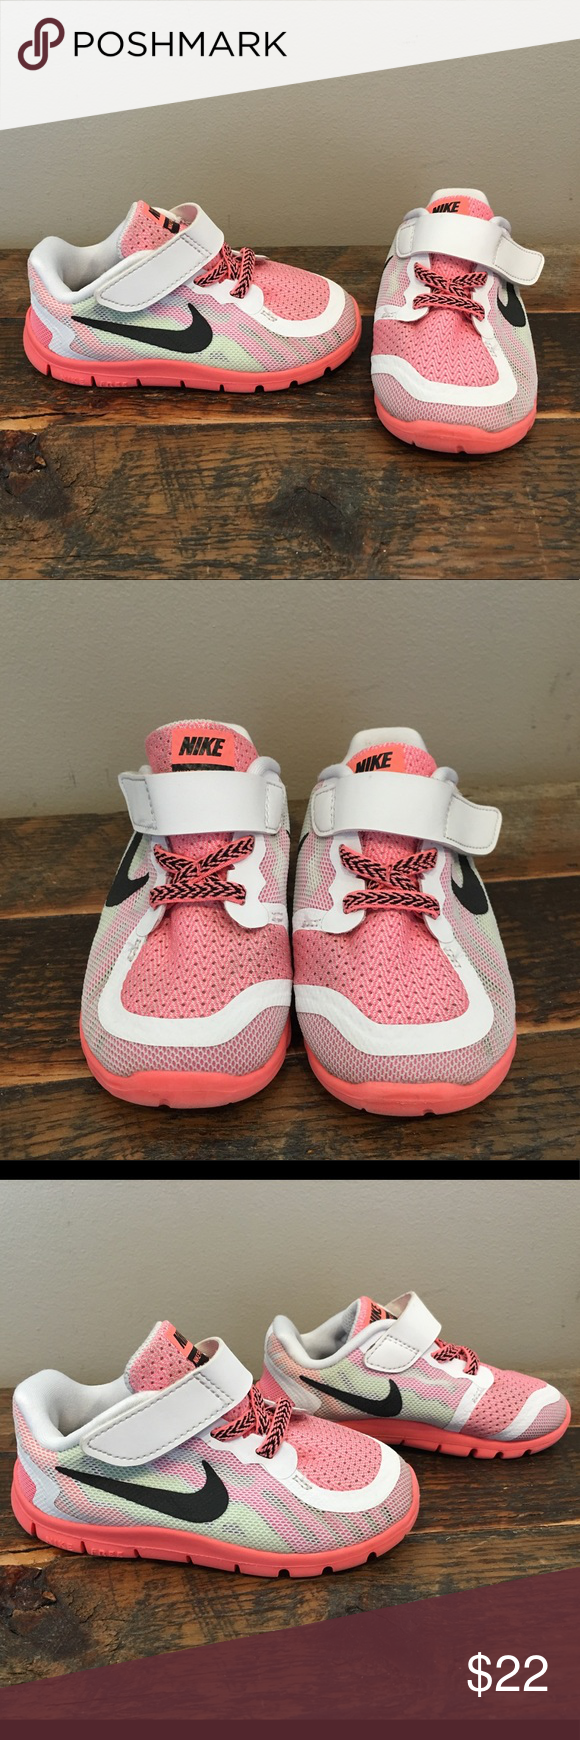 Nike Free 5.0 Girls Running Shoes Sz Youth 7